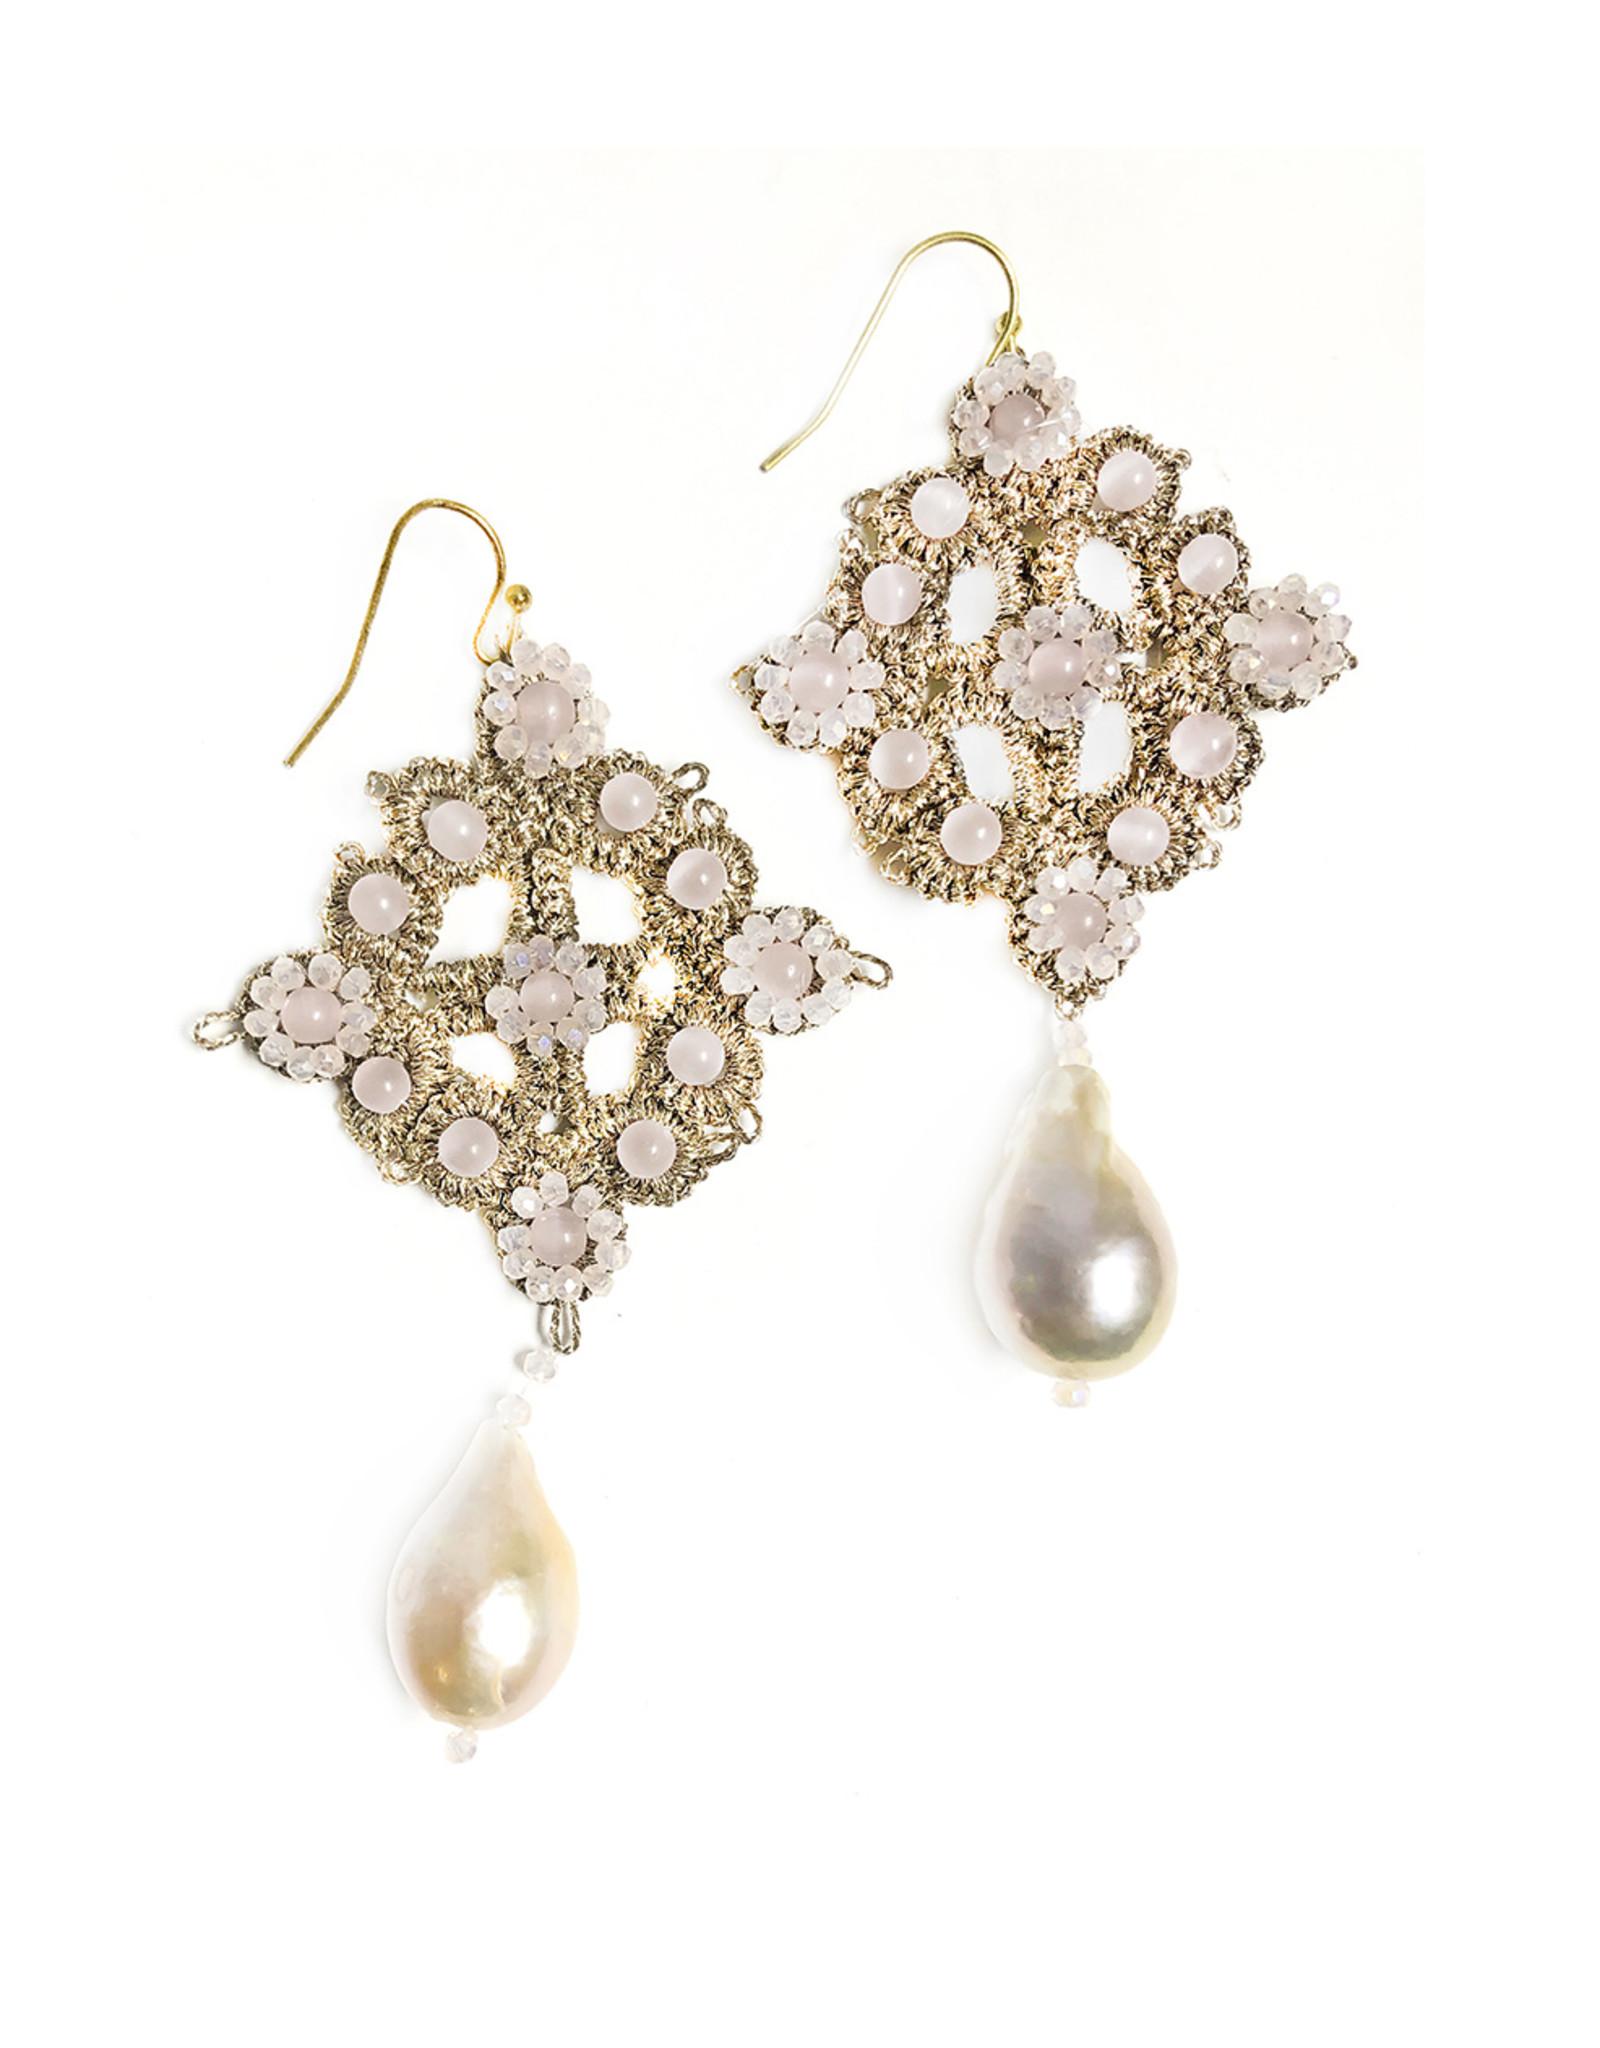 Agata Treasures Ortigia soft pink pendant earrings